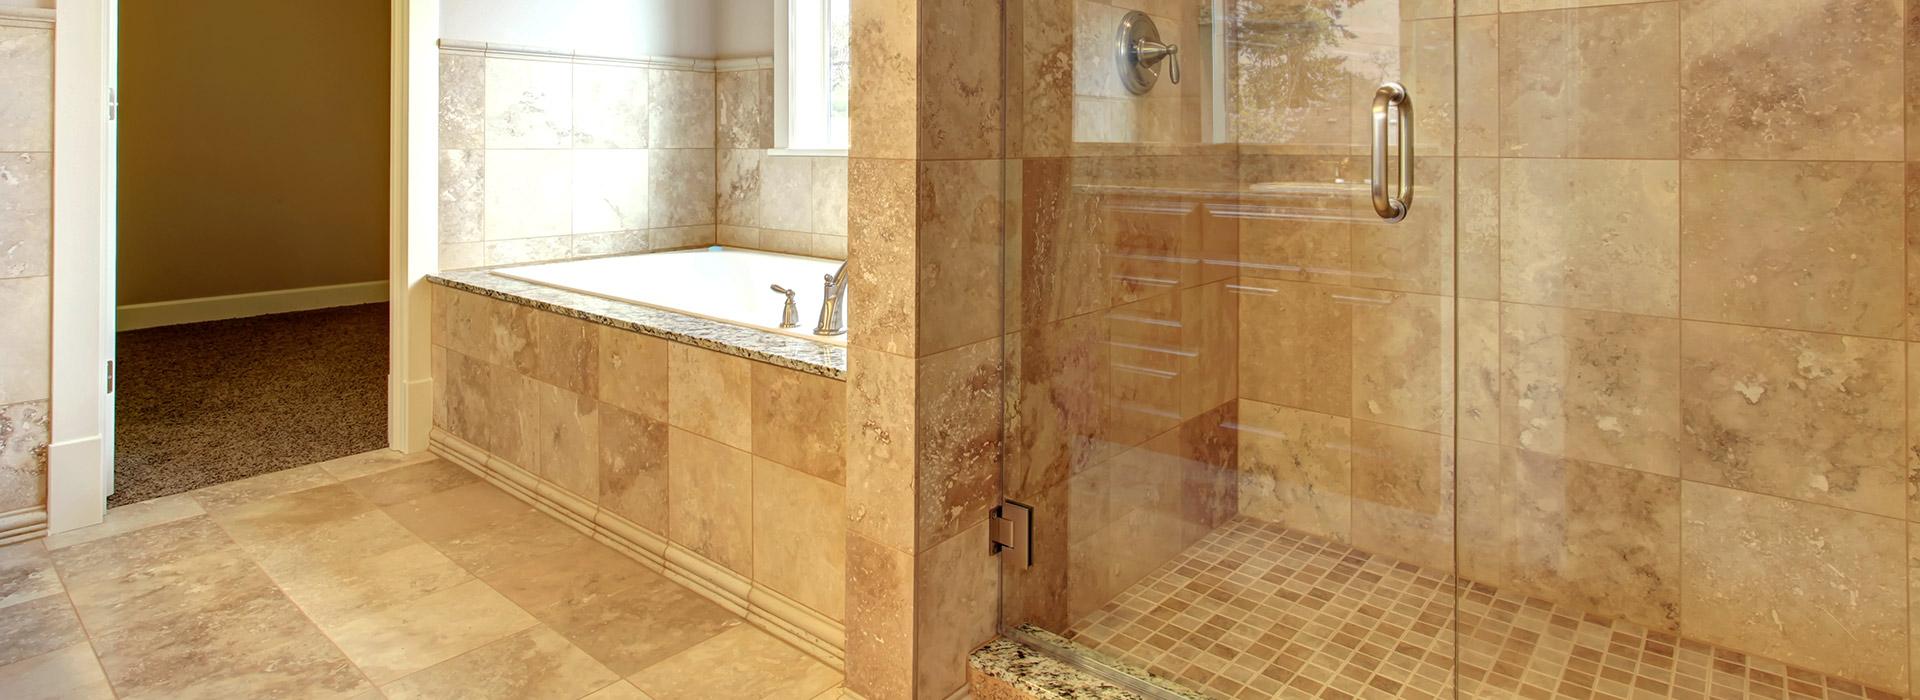 tile flooring contractor memphis tn